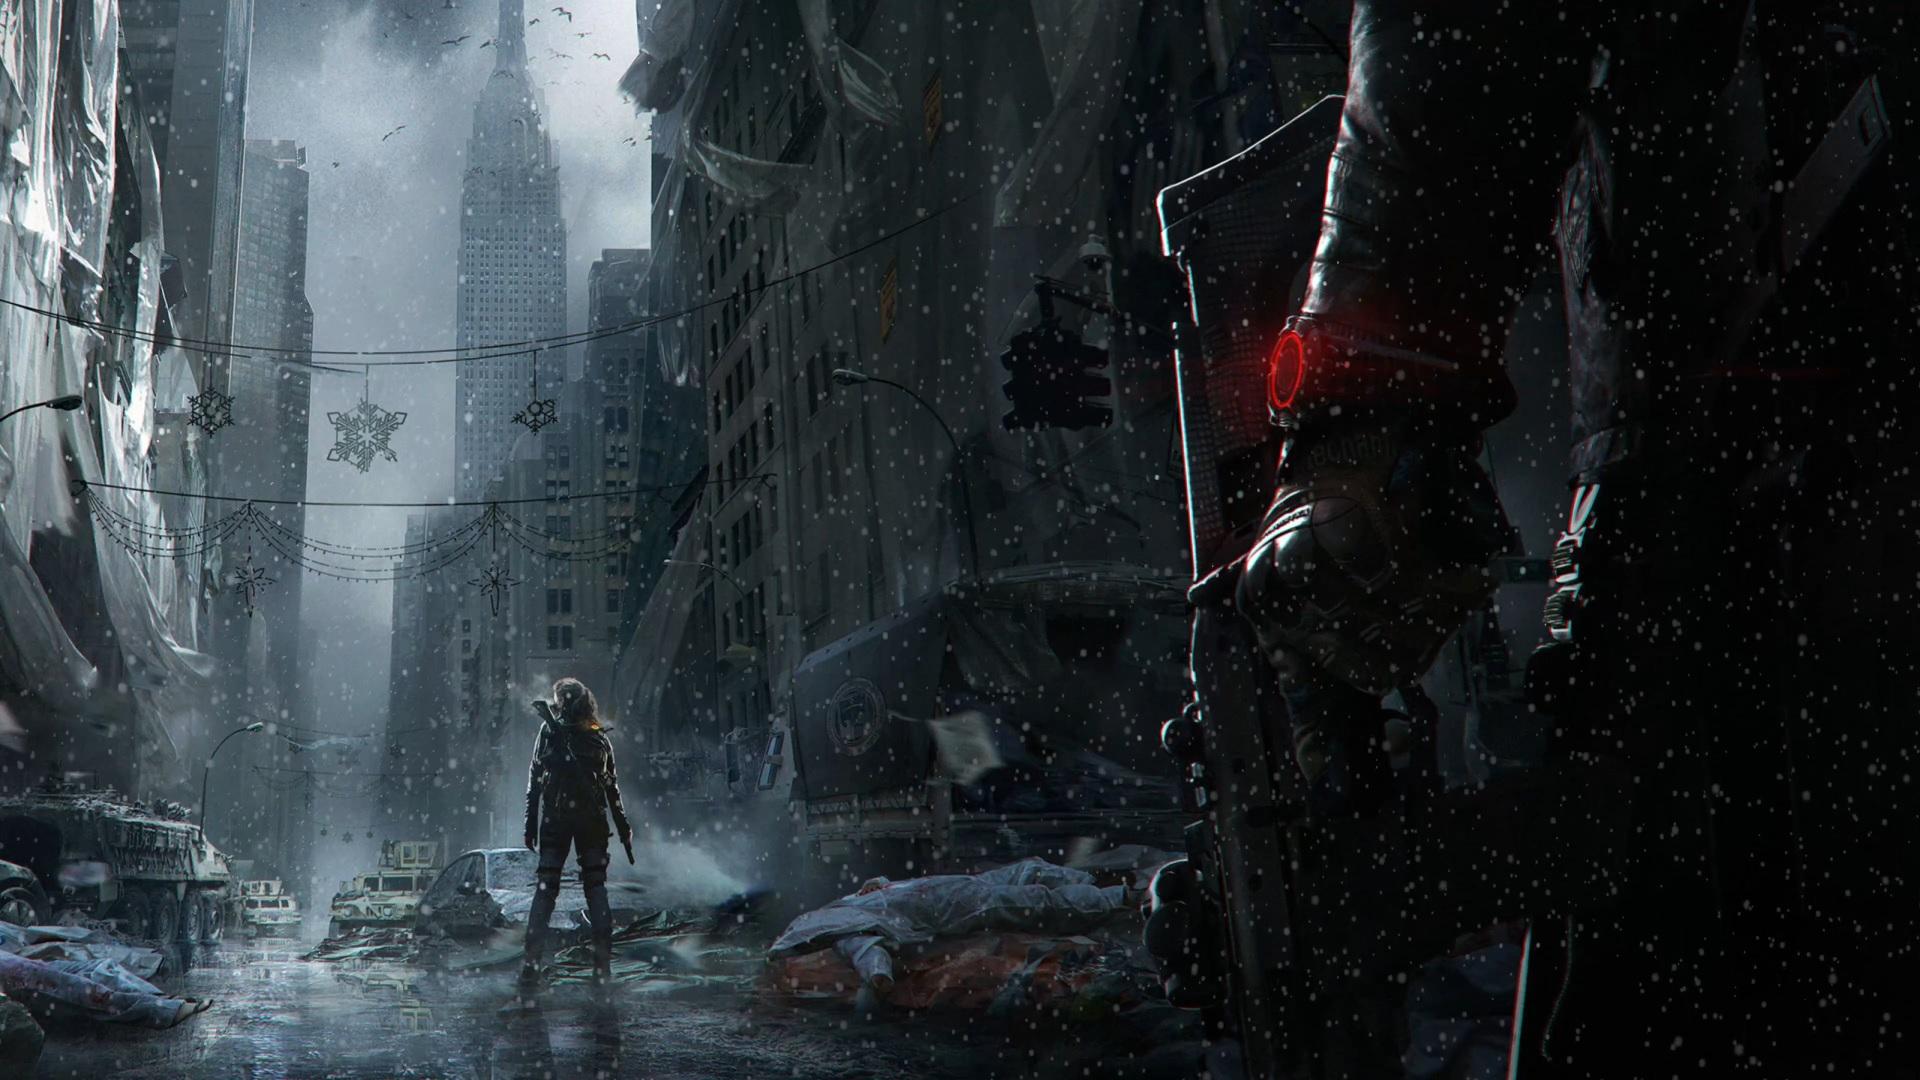 Steam Tom Clancys The Division 4K Wallpaper BGM